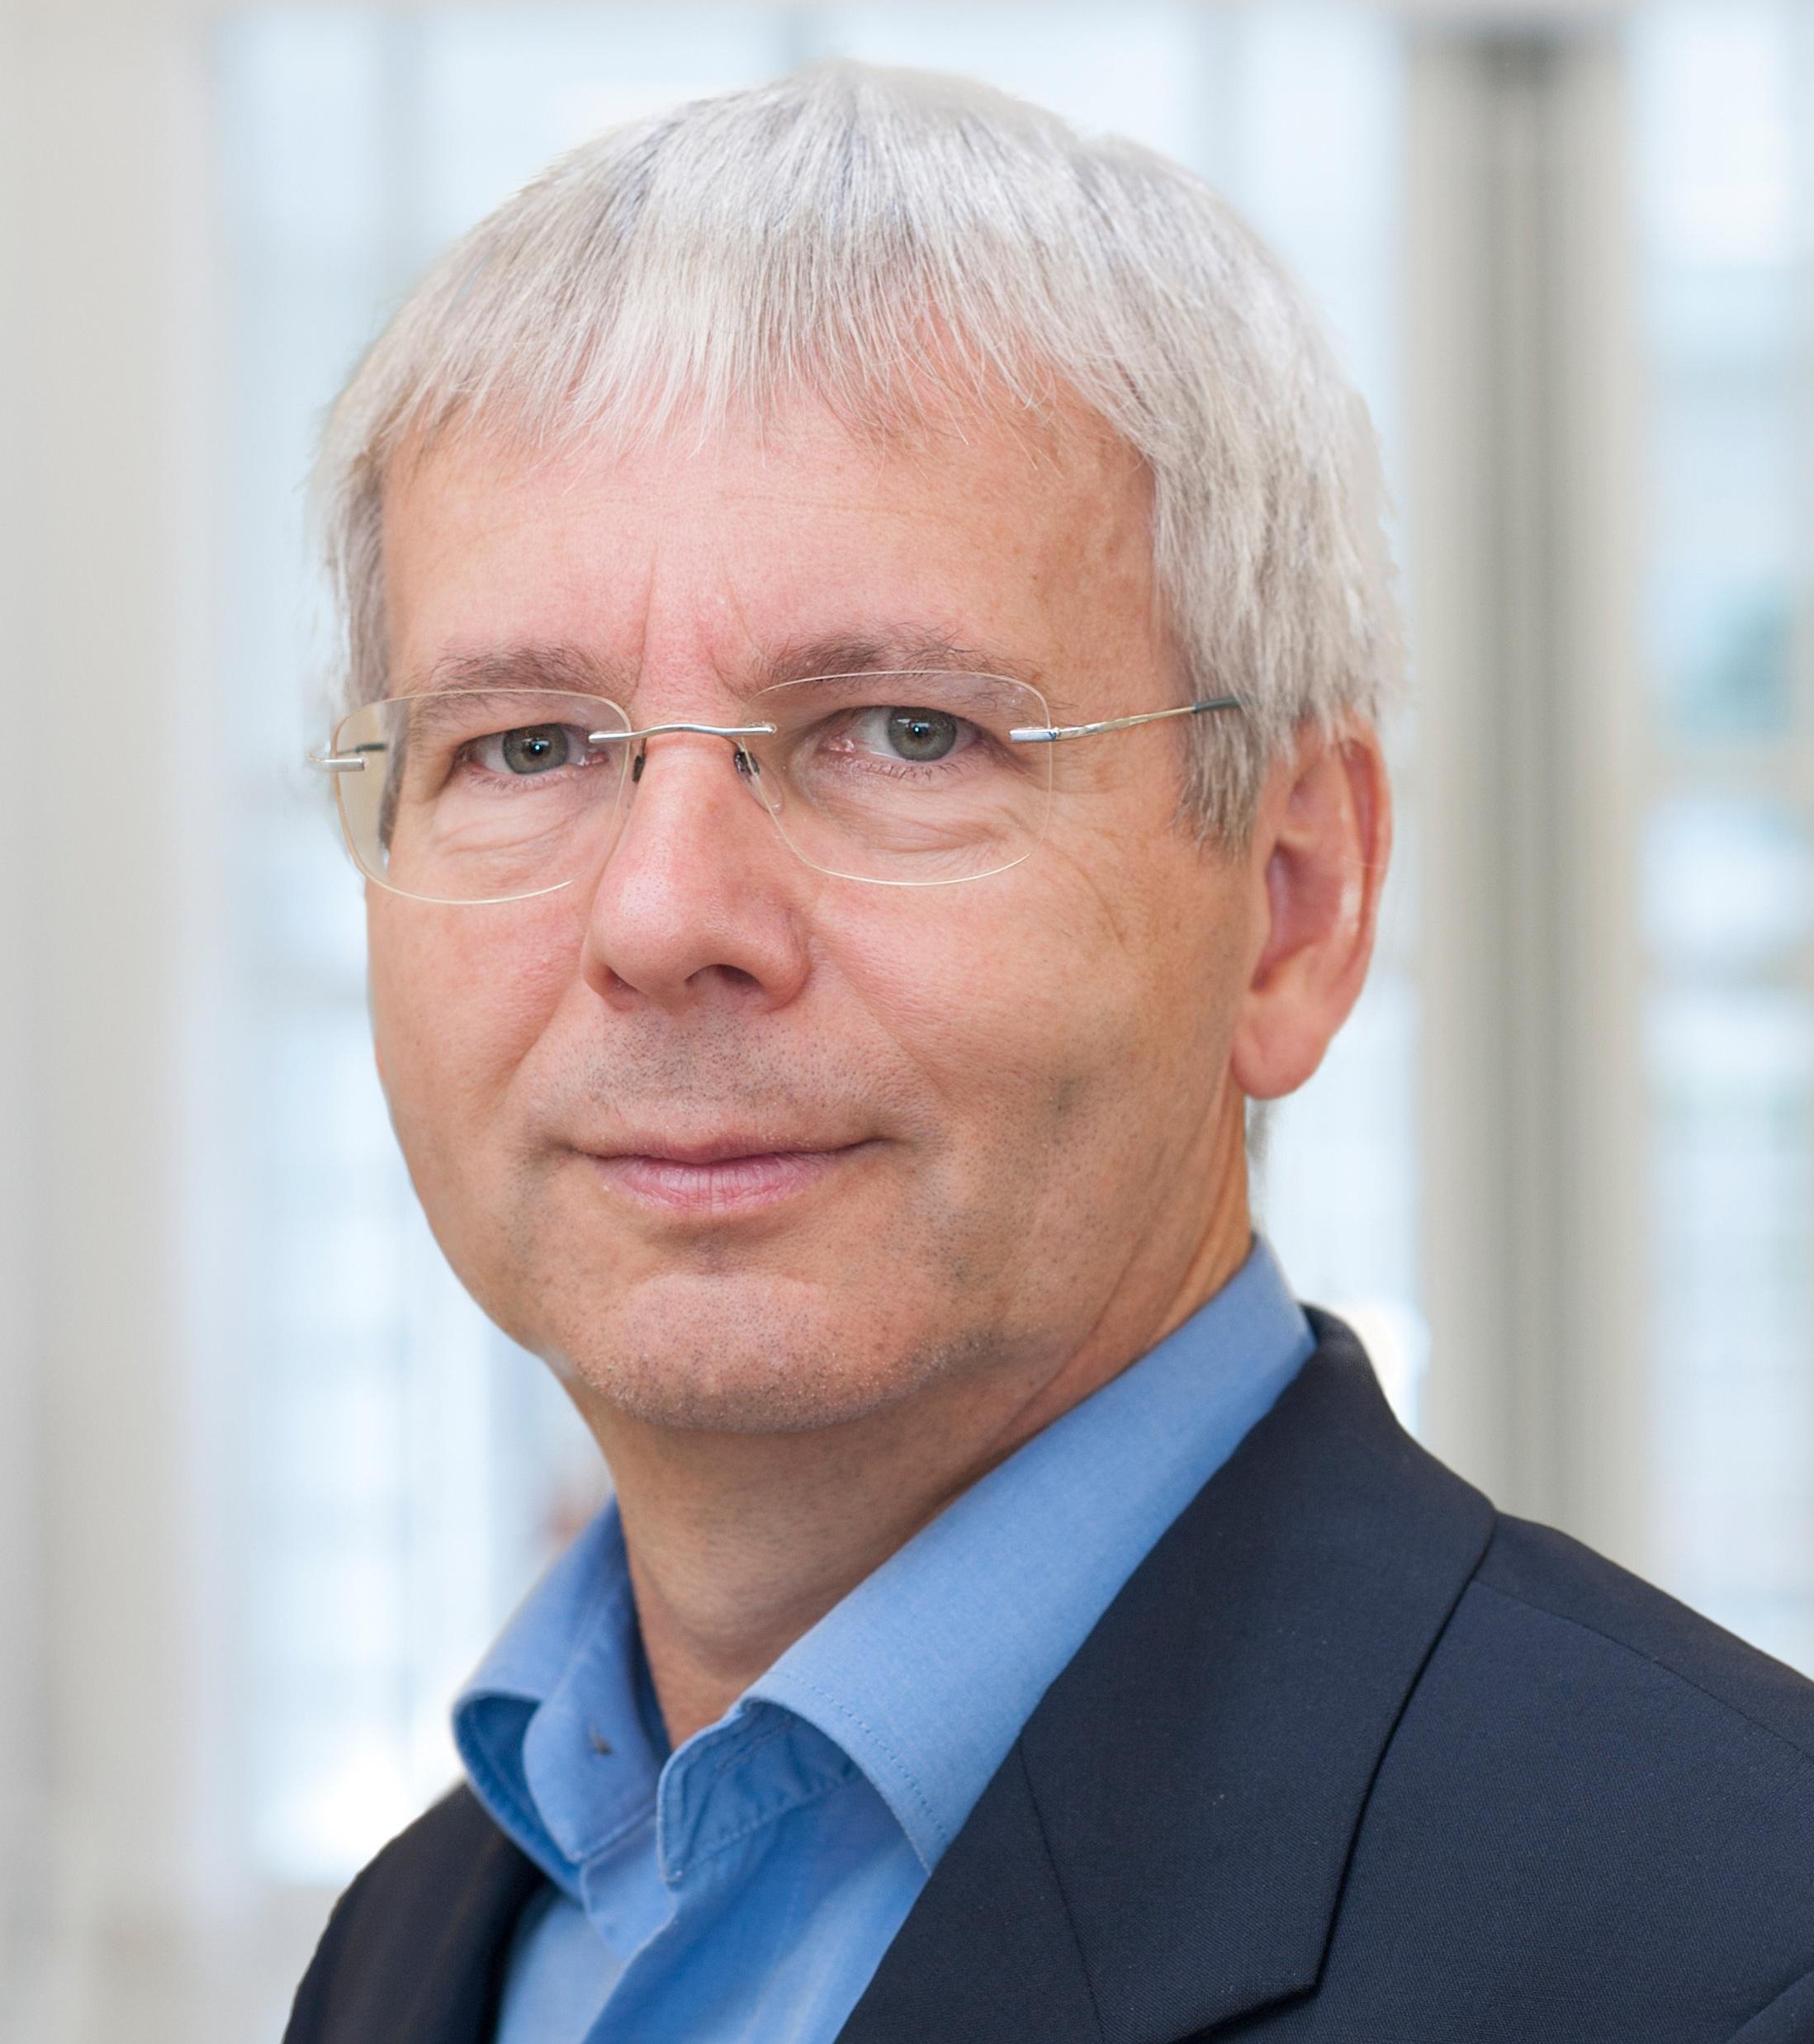 Dr. Ralf Küppers   University of Duisburg-Essen, Germany